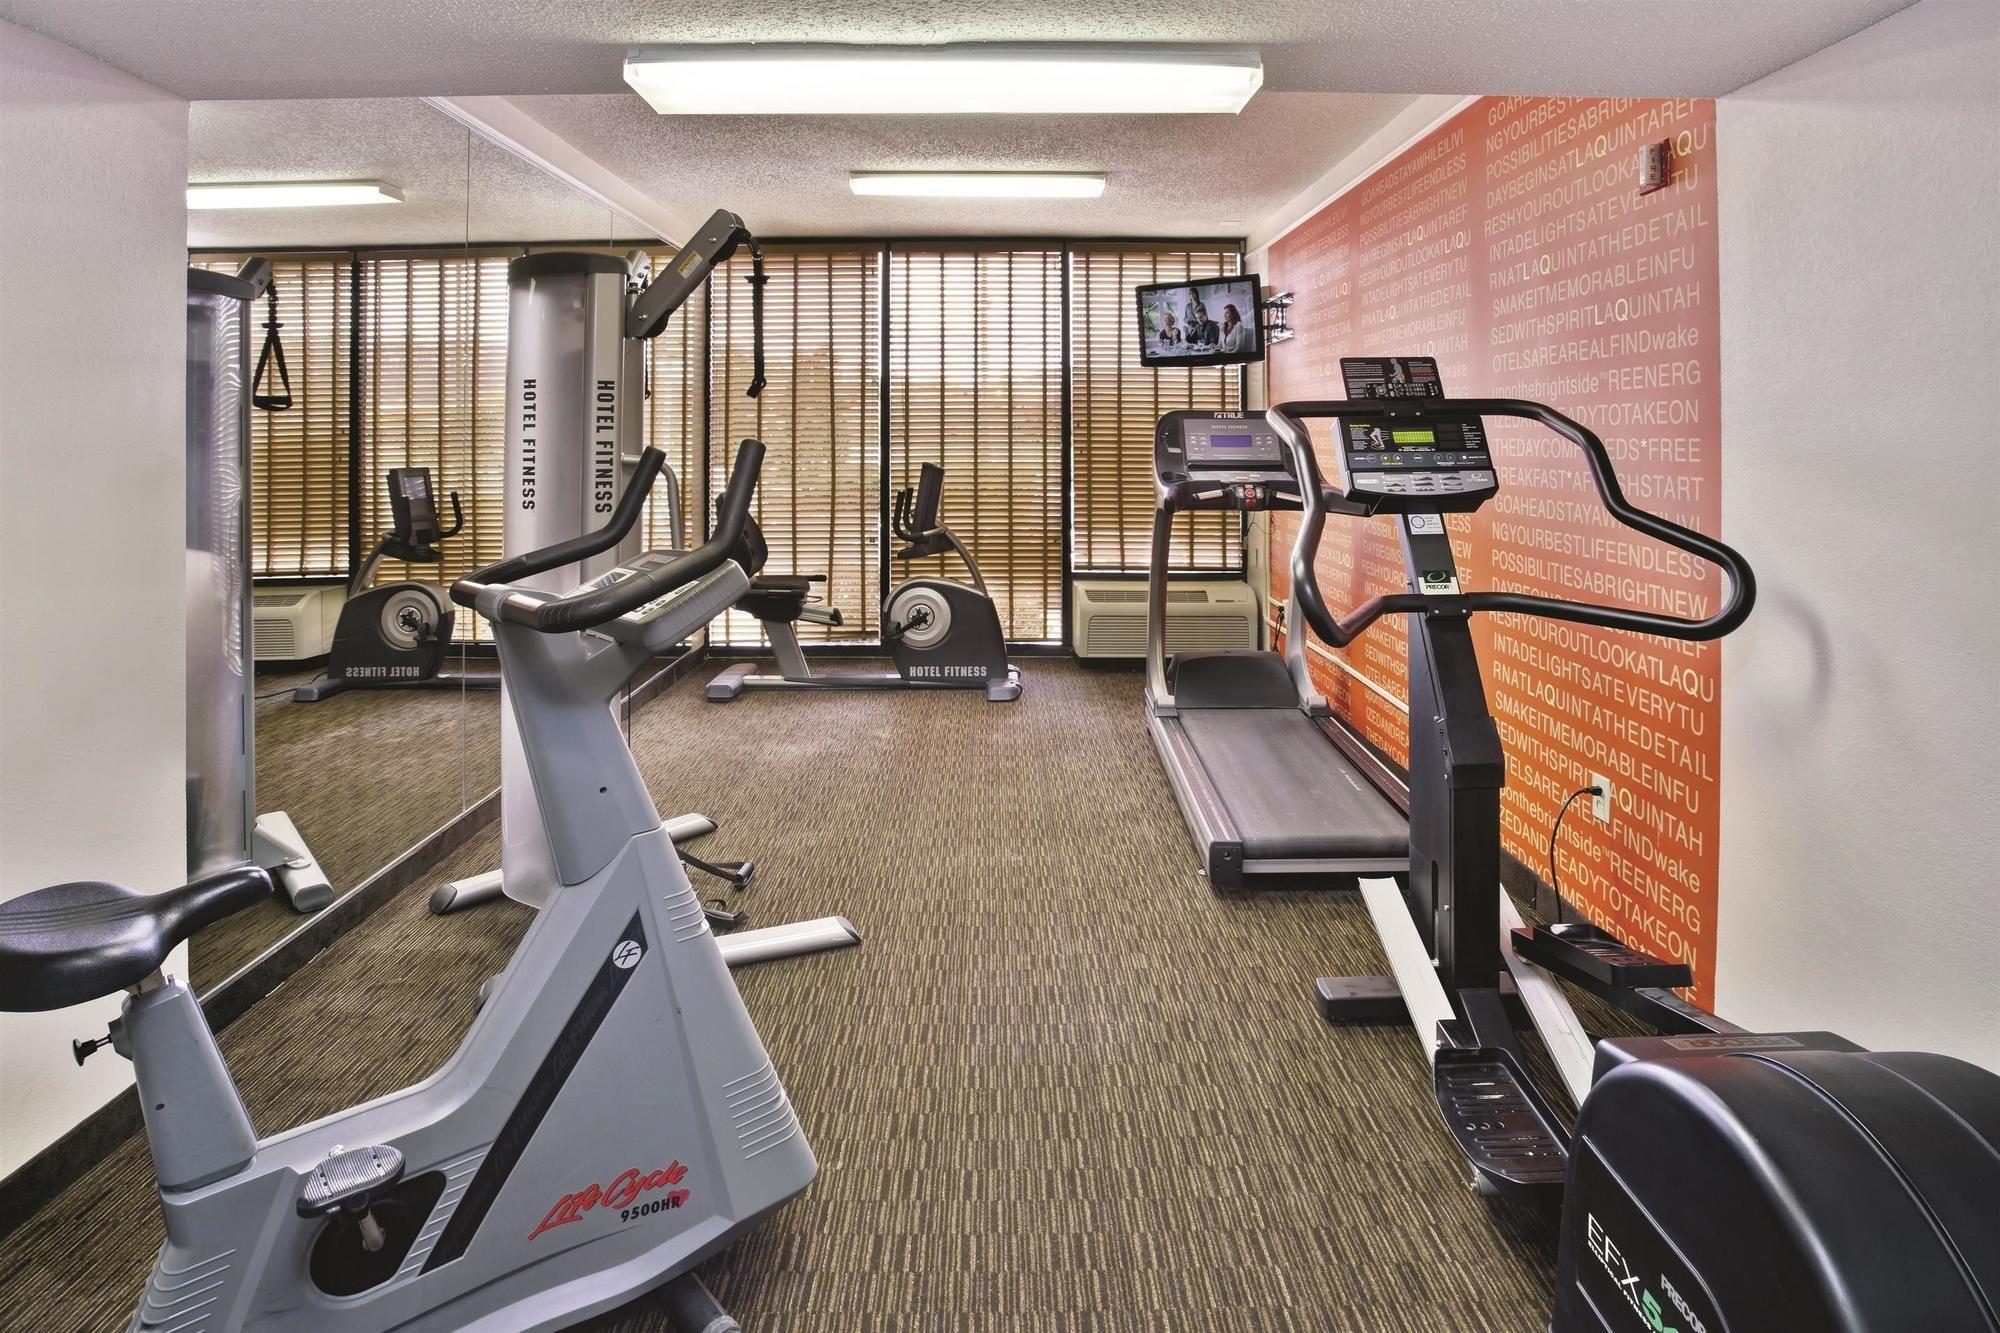 La Quinta Inn & Suites in Kingsport, TN